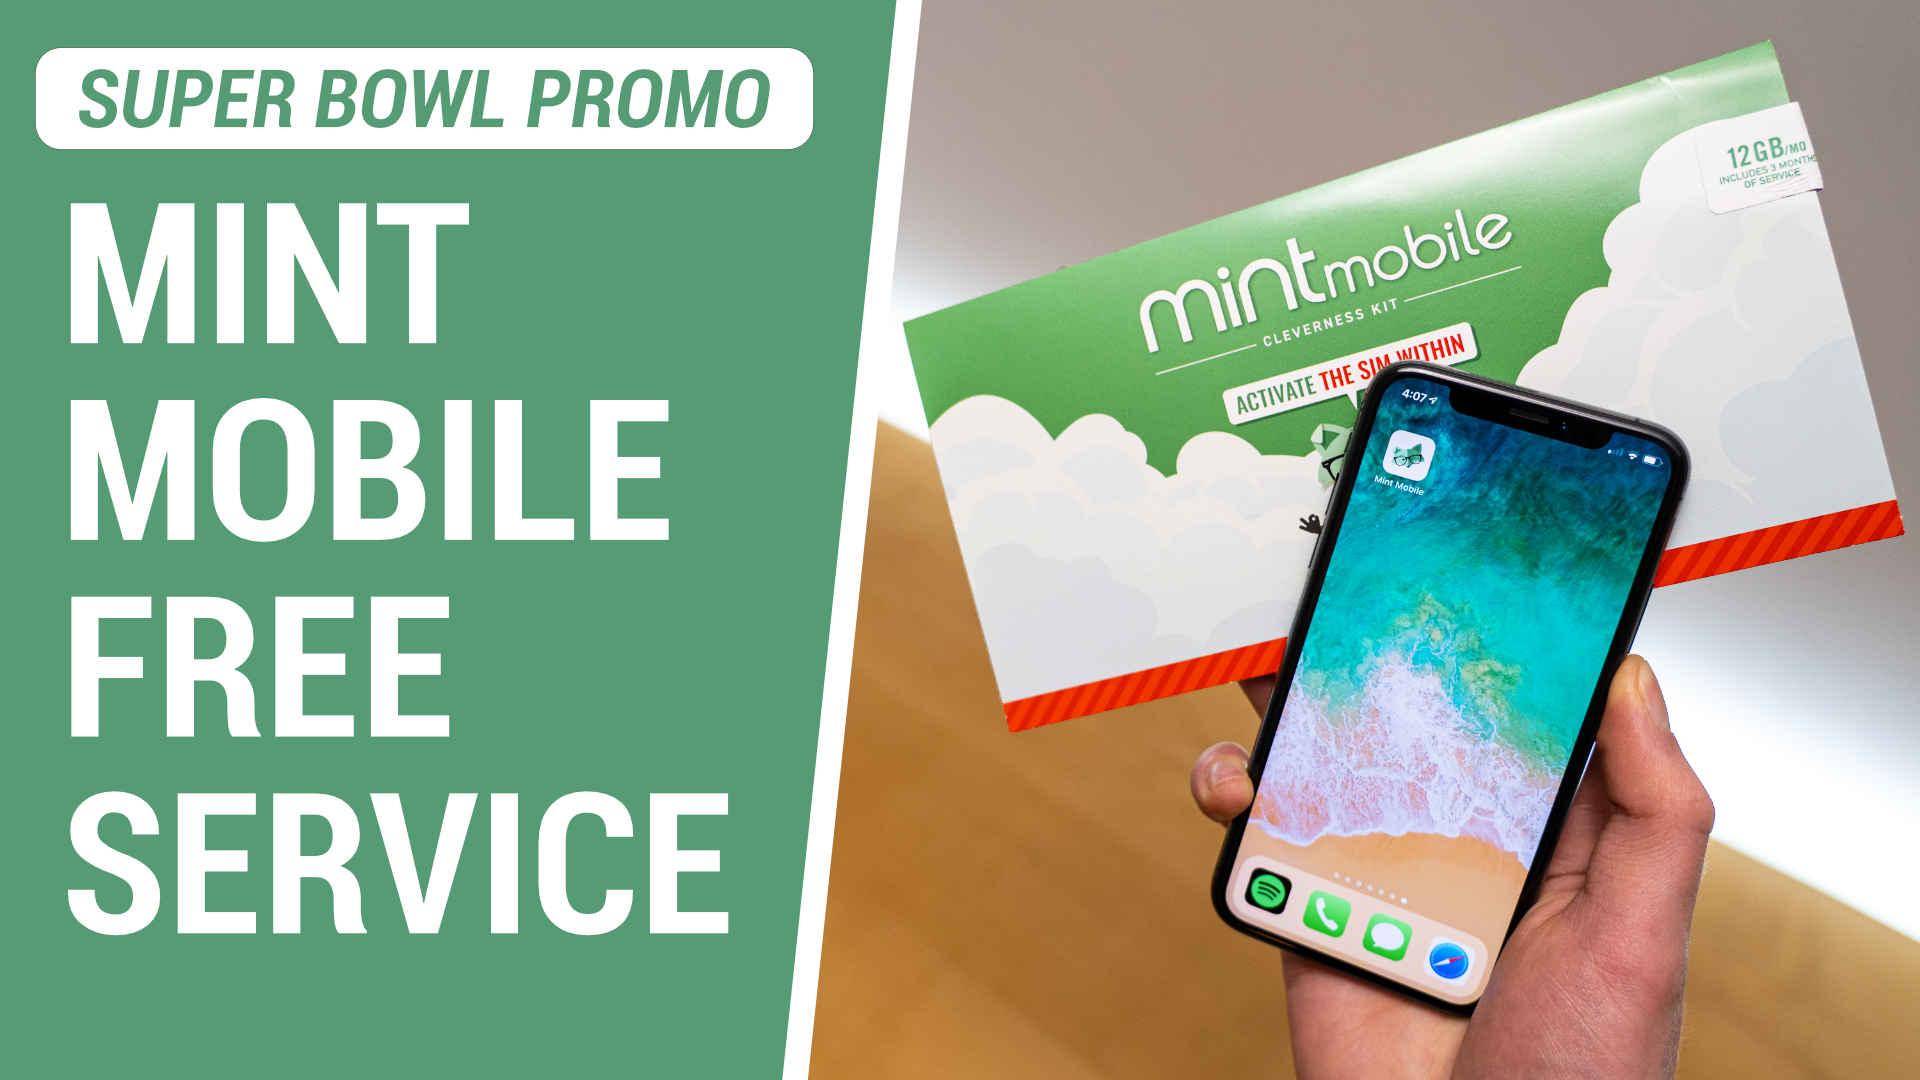 Mint Mobile free service promotion during Super Bowl 54